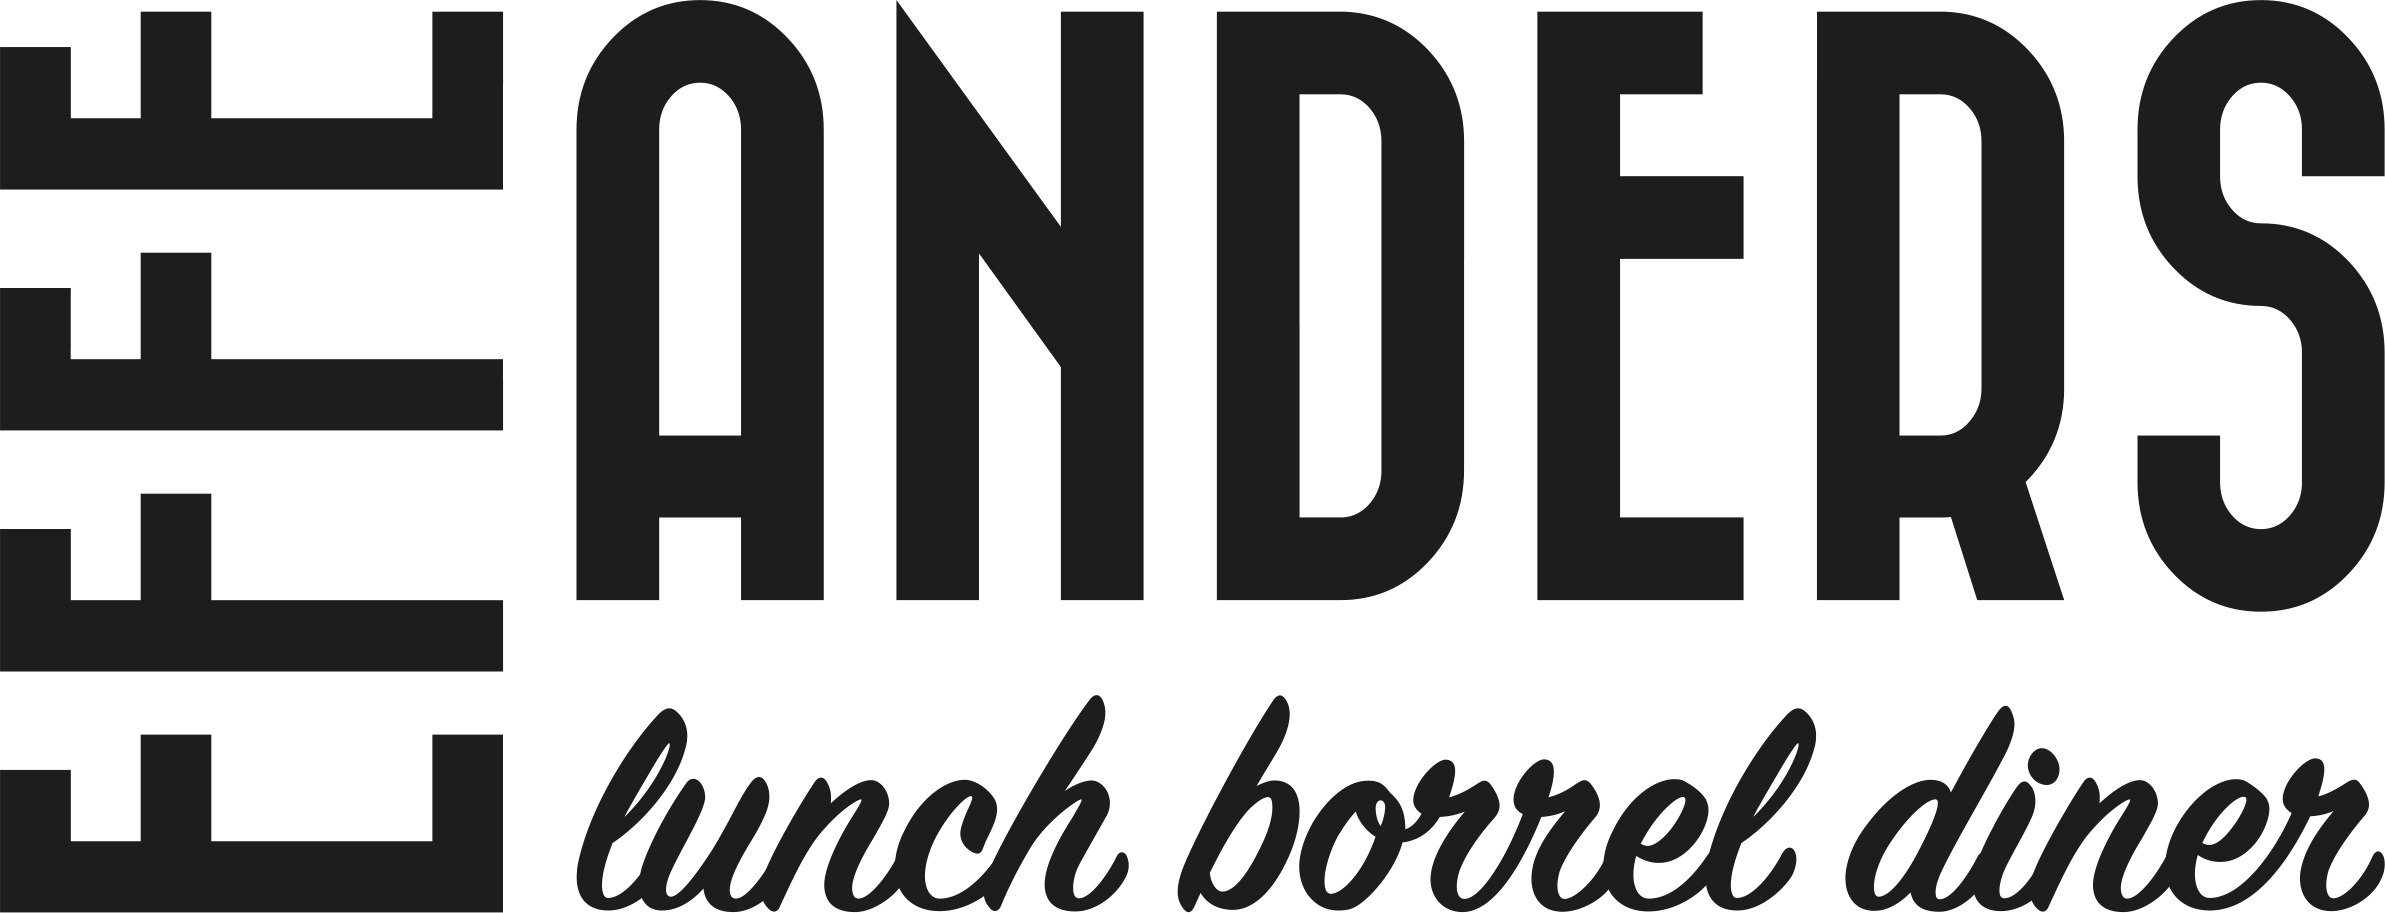 Effe-Anders-logo-zw